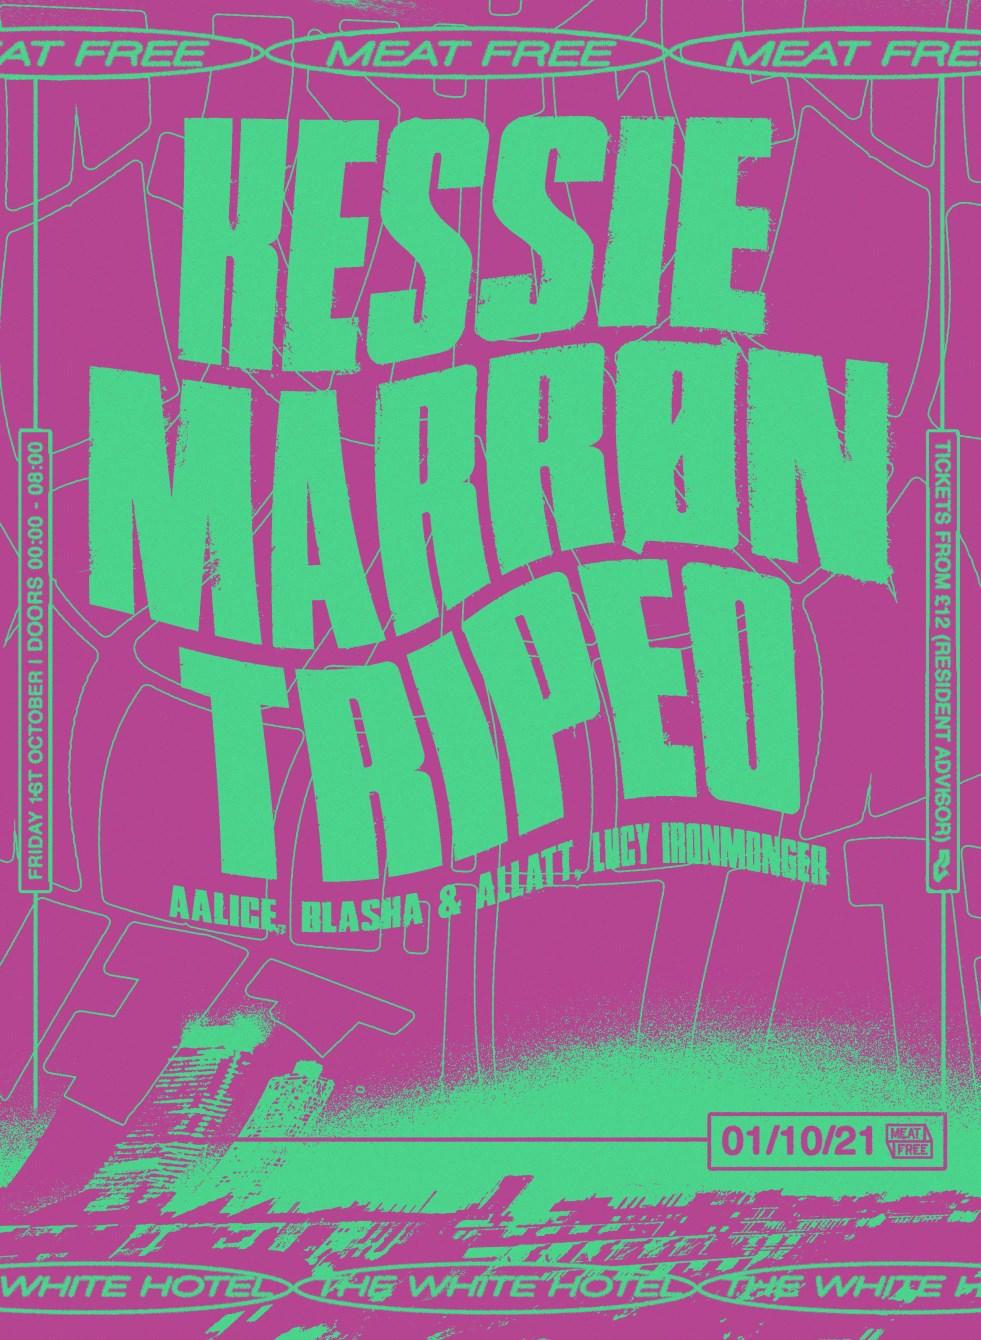 Meat Free with Kessie, Marrøn & Tripeo - Flyer front